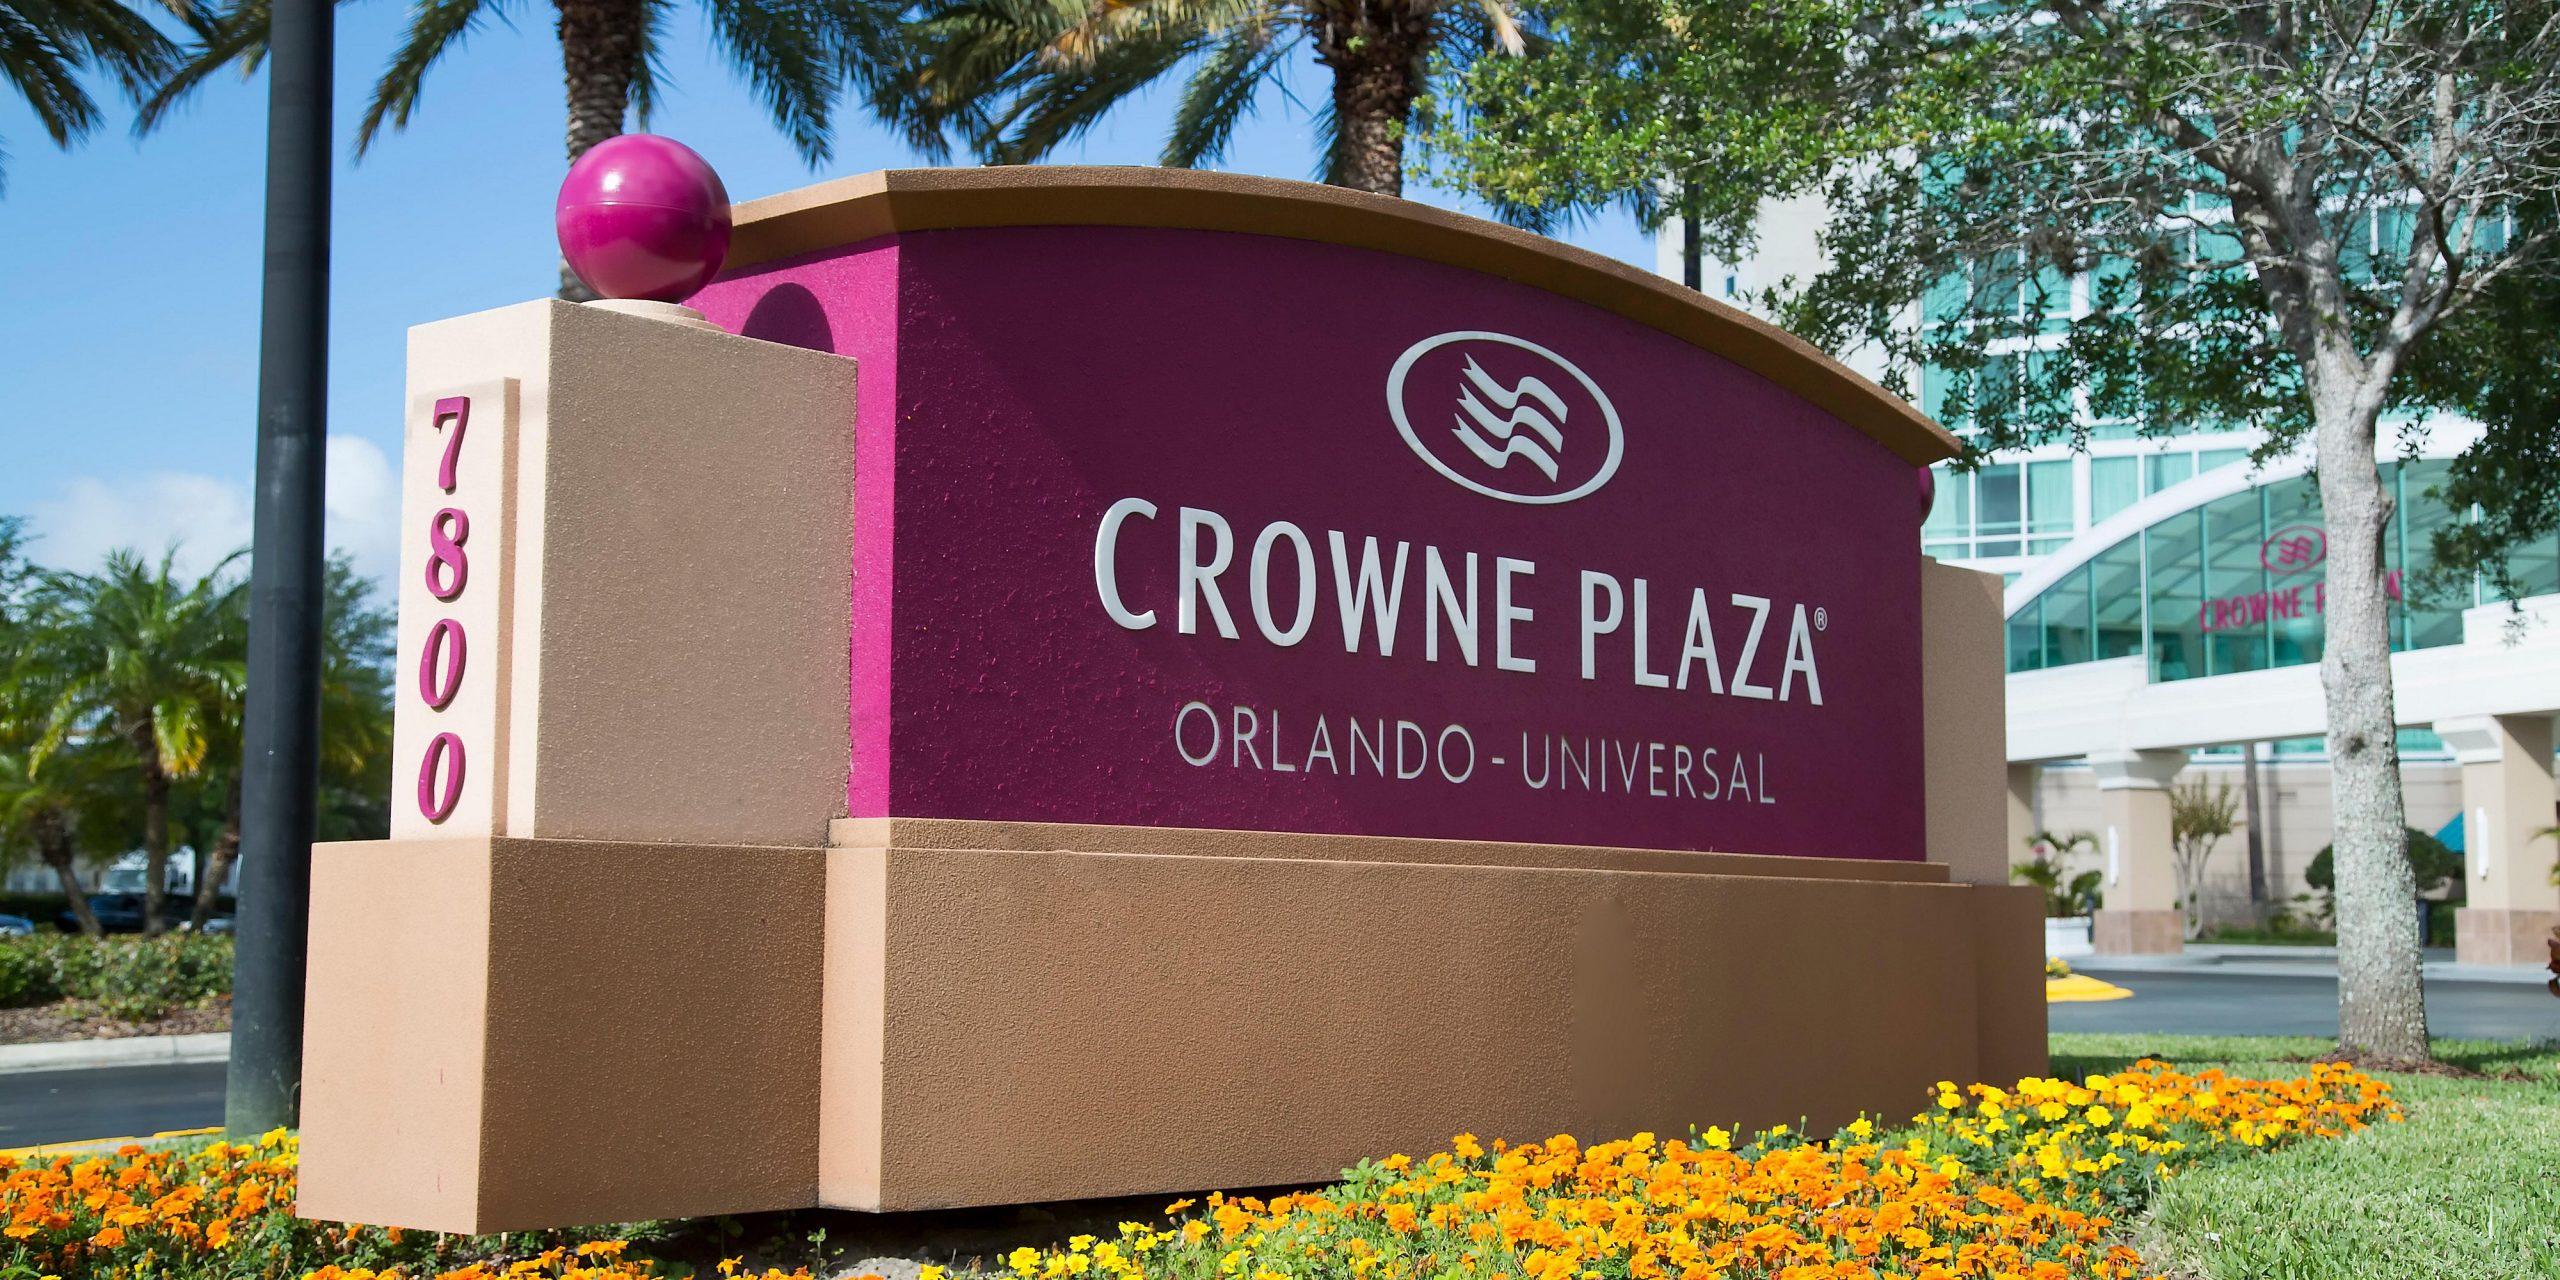 crowne-plaza-orlando-3890781518-2x1